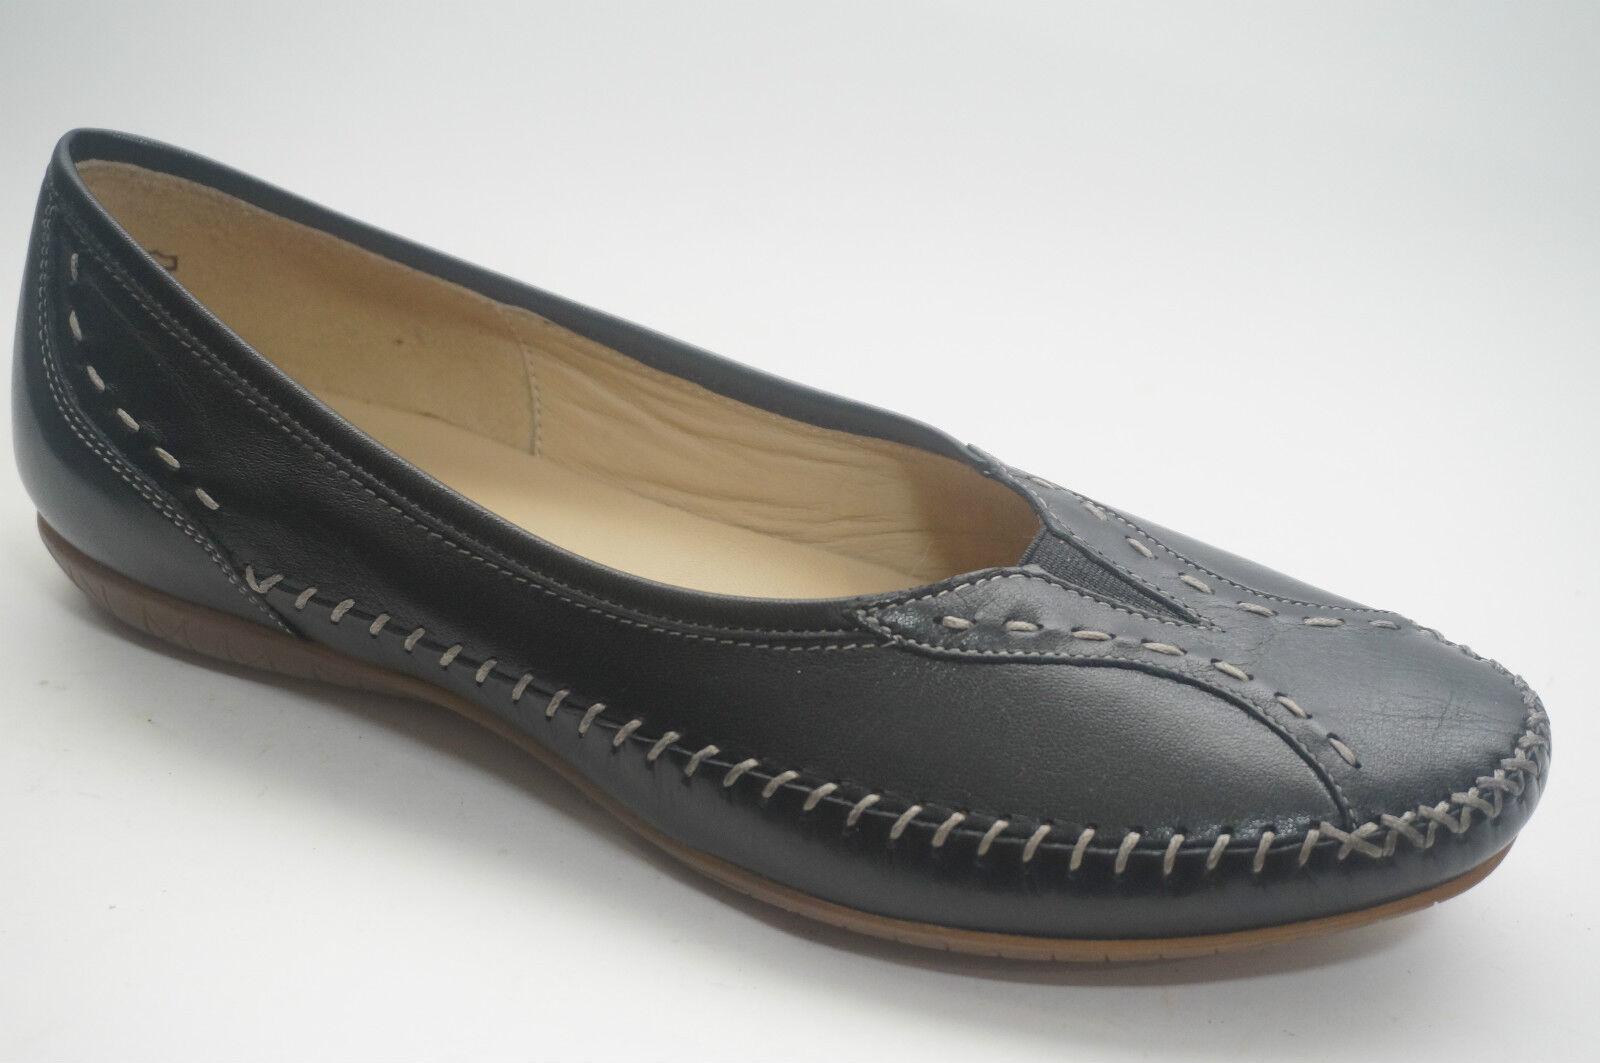 1758  Sioux zapatos zapatos zapatos deportiva bailarina mocasines talla 41 UK 7,5 negro cuero liso  venderse como panqueques